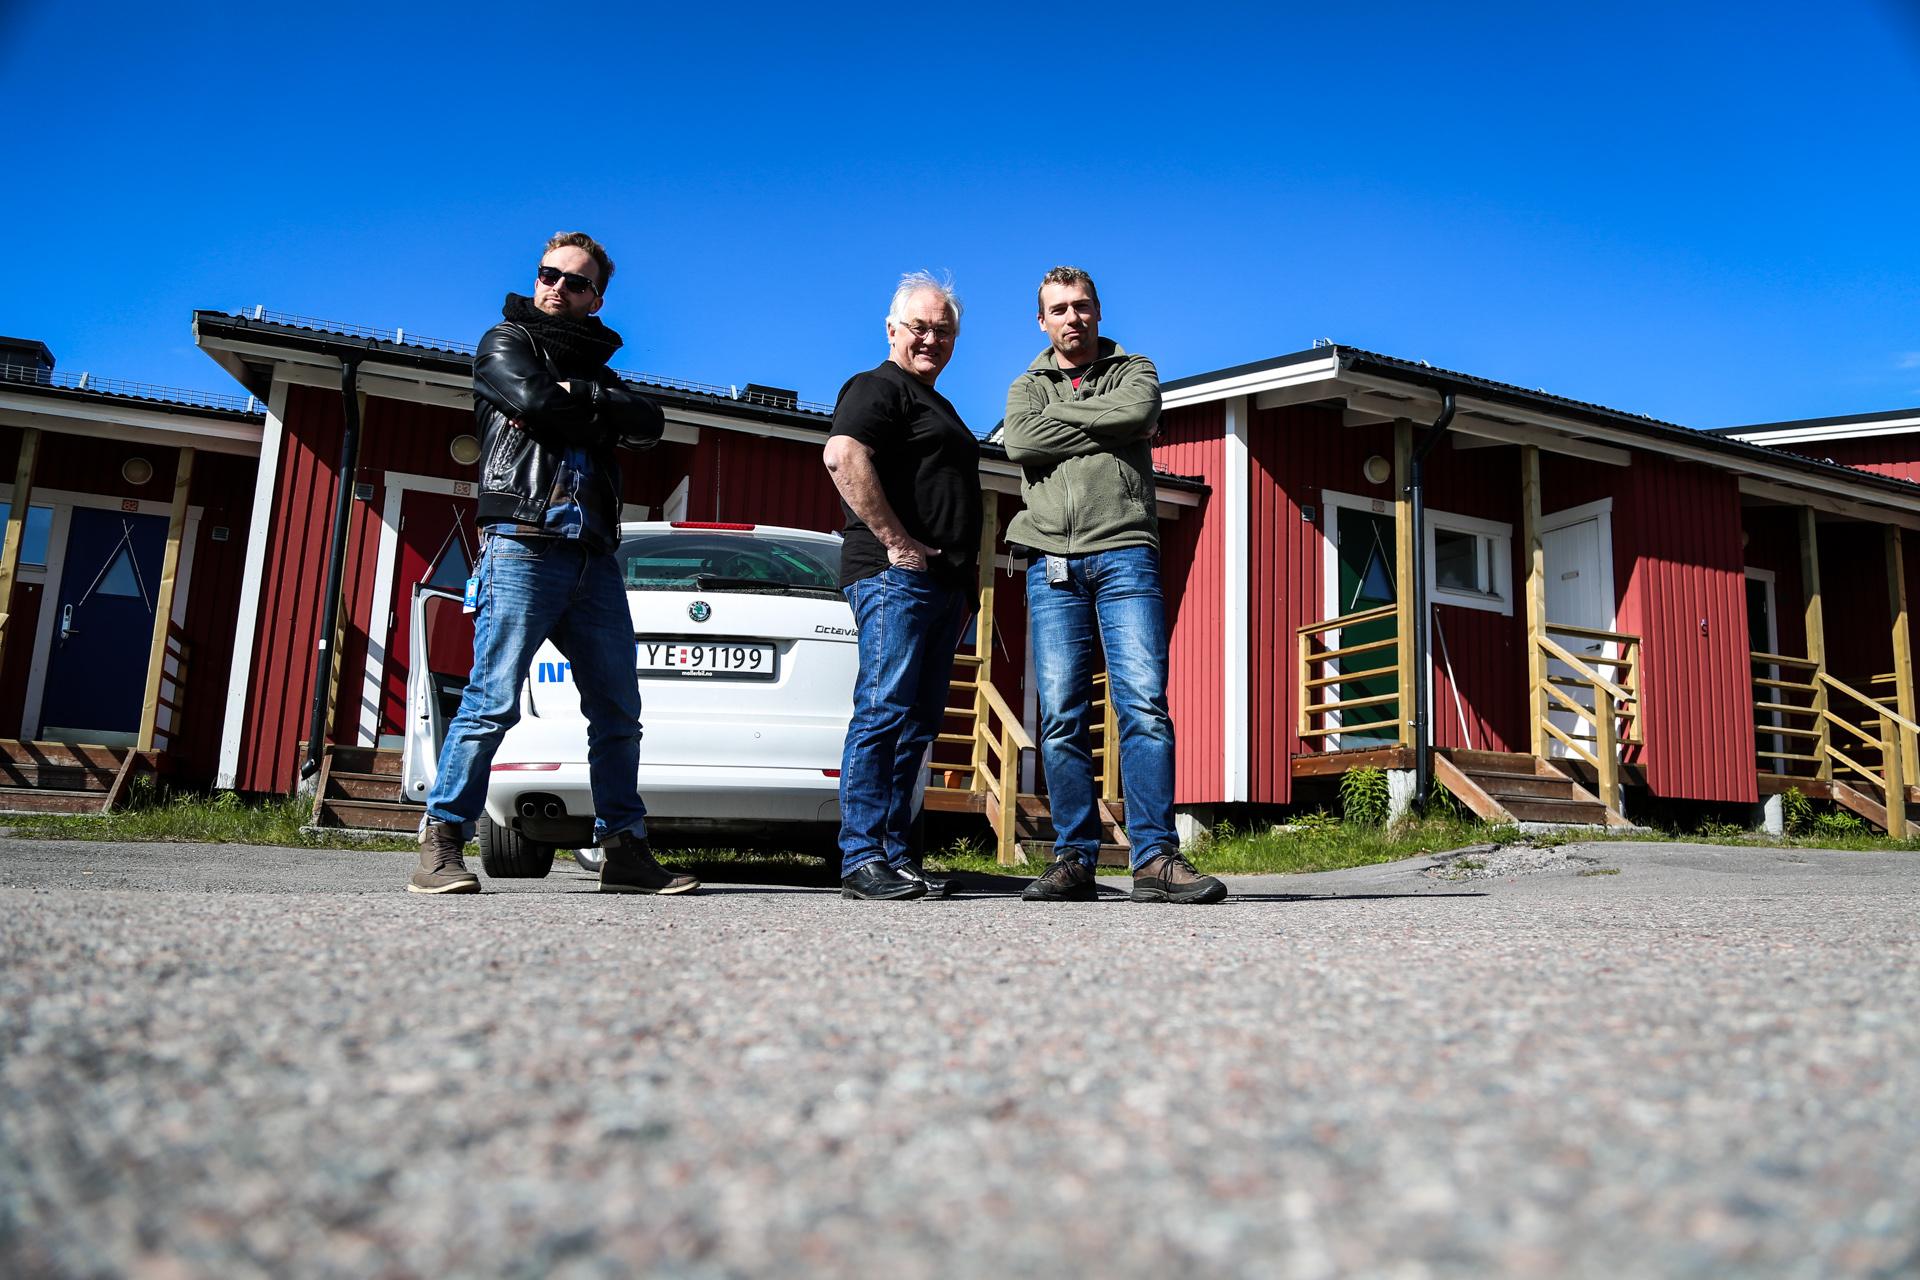 Photographer (Me), reporter (Kjell Mikalsen), and FlyAway-operator (Lars-Bjørn Martinsen) at Ripan Camping, Kiruna, Sweden.